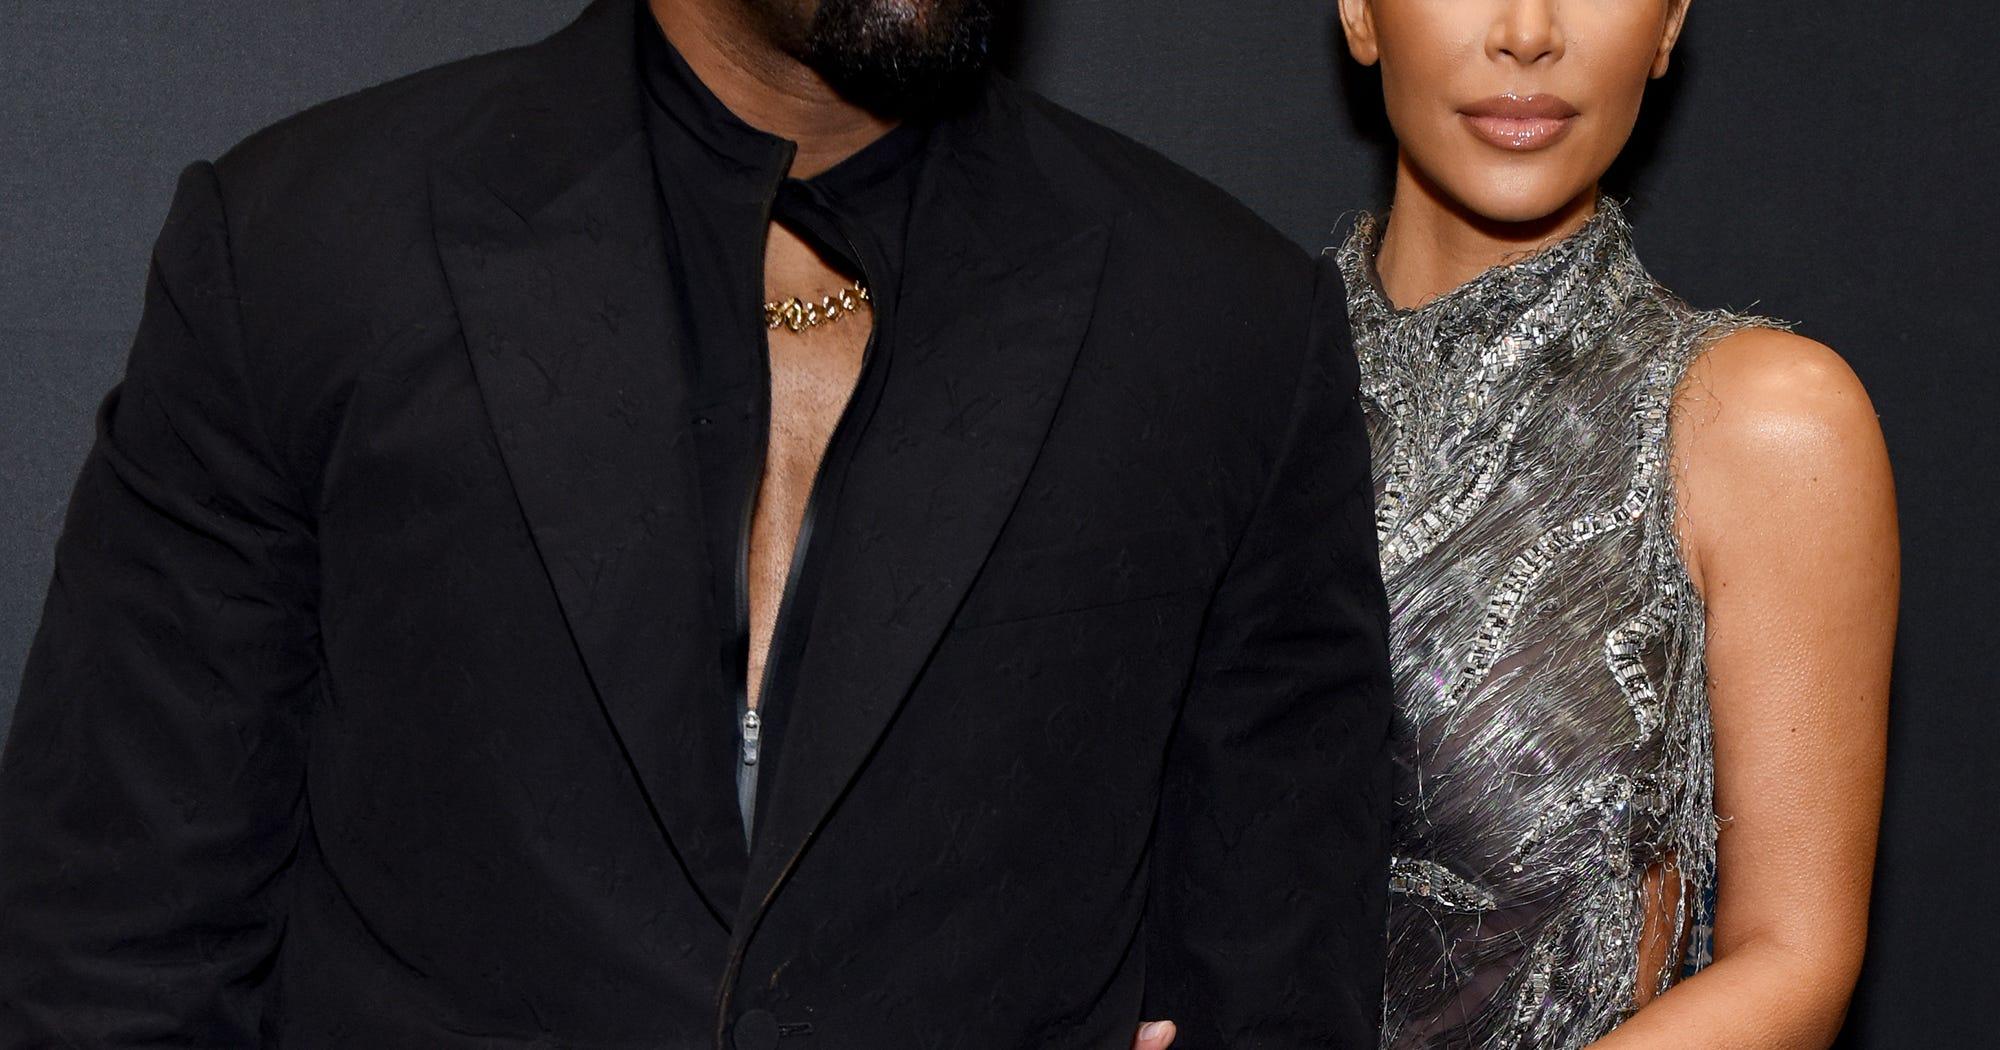 Kardashian Hollywood dating 2000 co foreldre dating